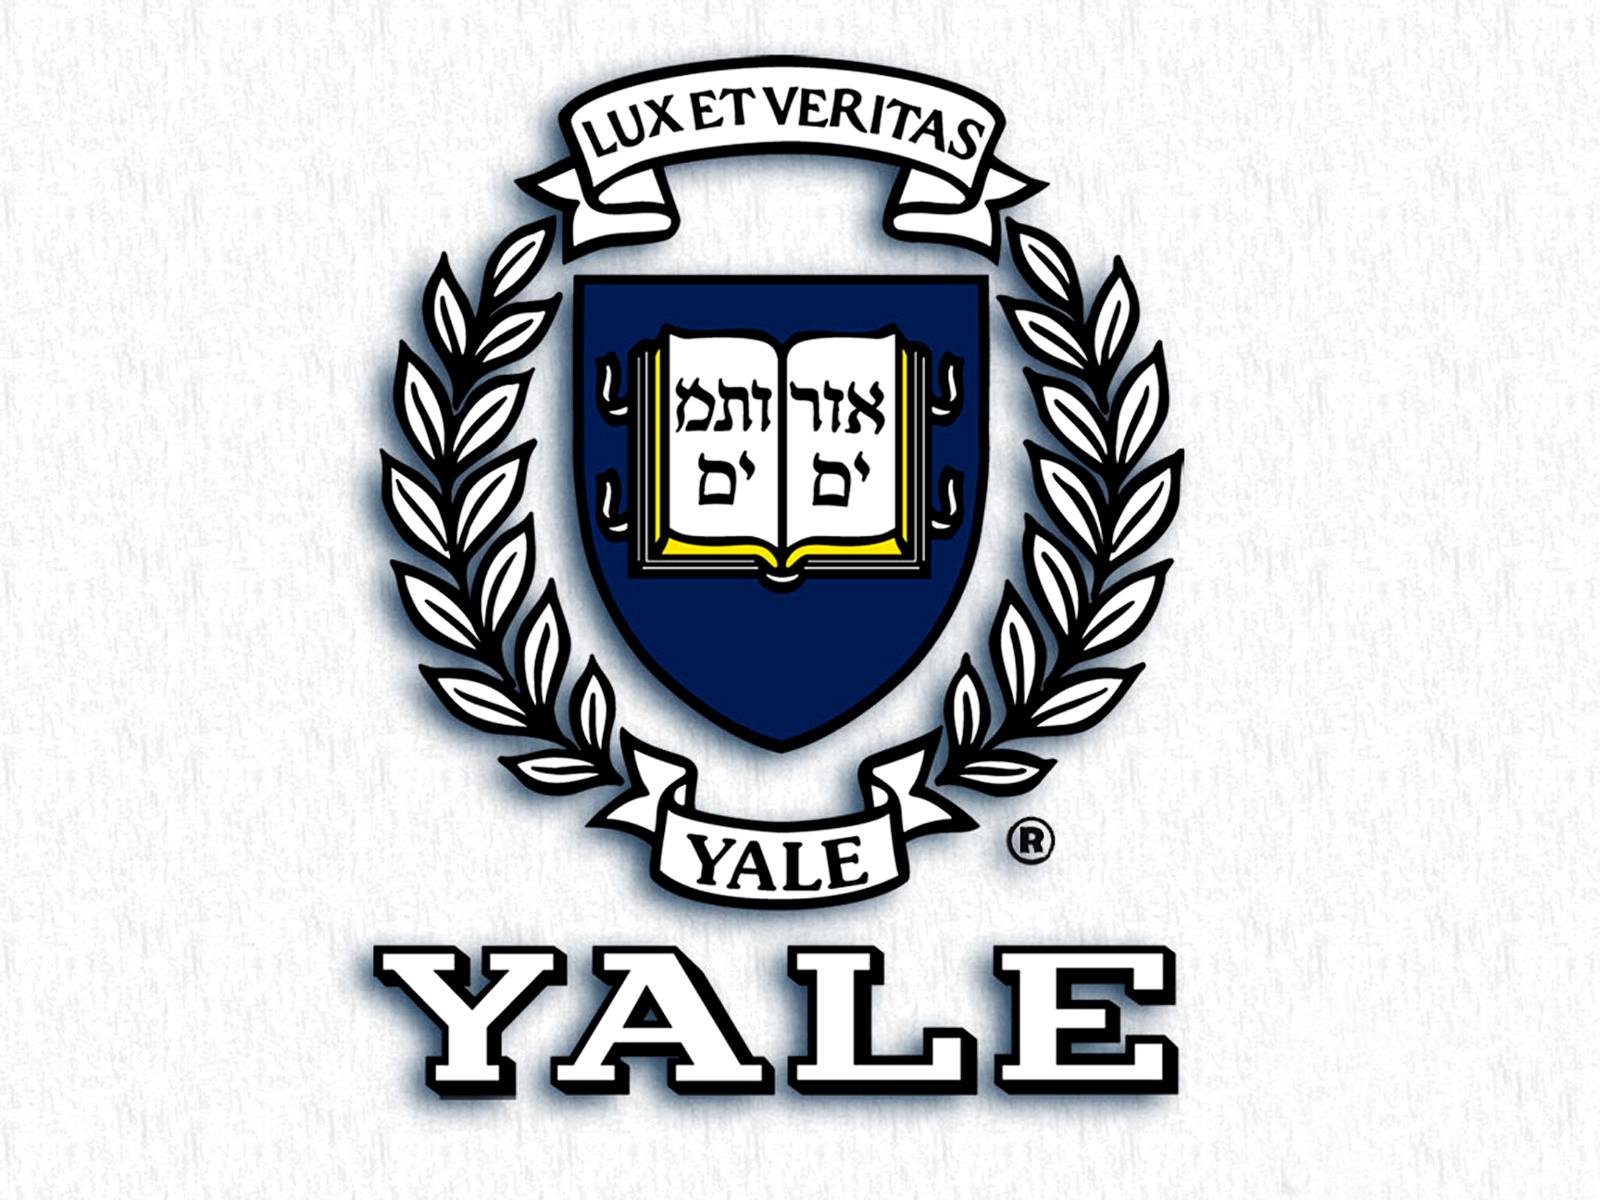 http://2.bp.blogspot.com/-MjPMThKYxEs/TyfgDcJ06fI/AAAAAAAAAdA/G-WRxpTS5IE/s1600/Yale_University_Lux_Et_Veritas_Logo-Vvallpaper.Net.jpg